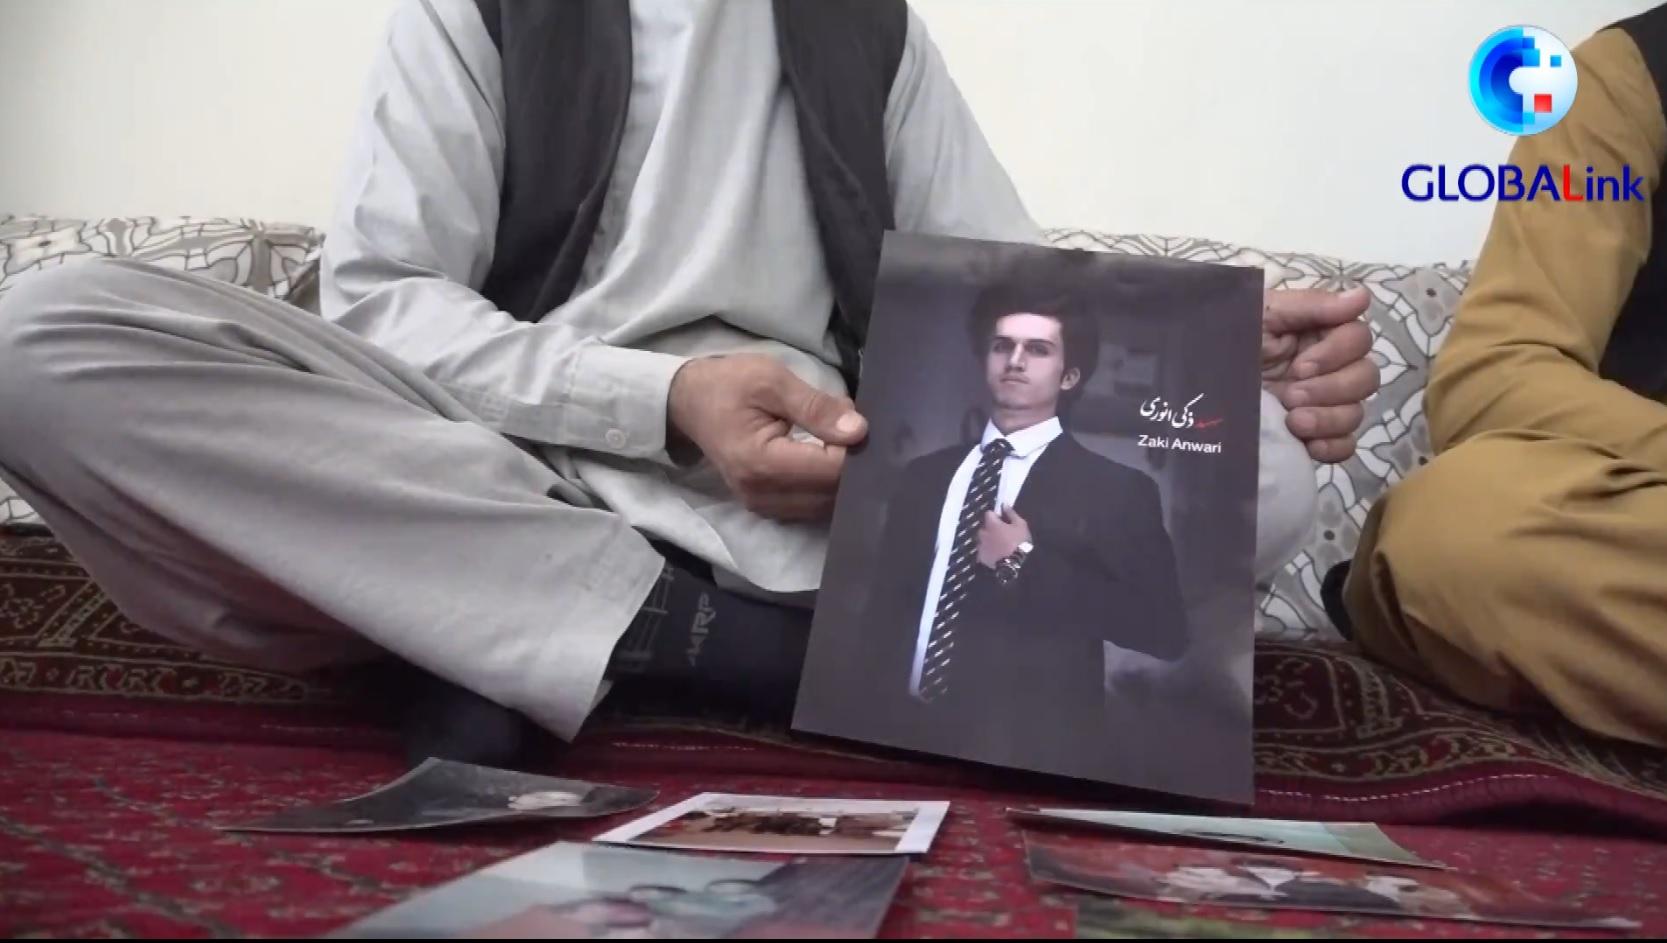 GLOBALink | Afghan man accuses American pilot's arrogance over brother's death, calls for investigation